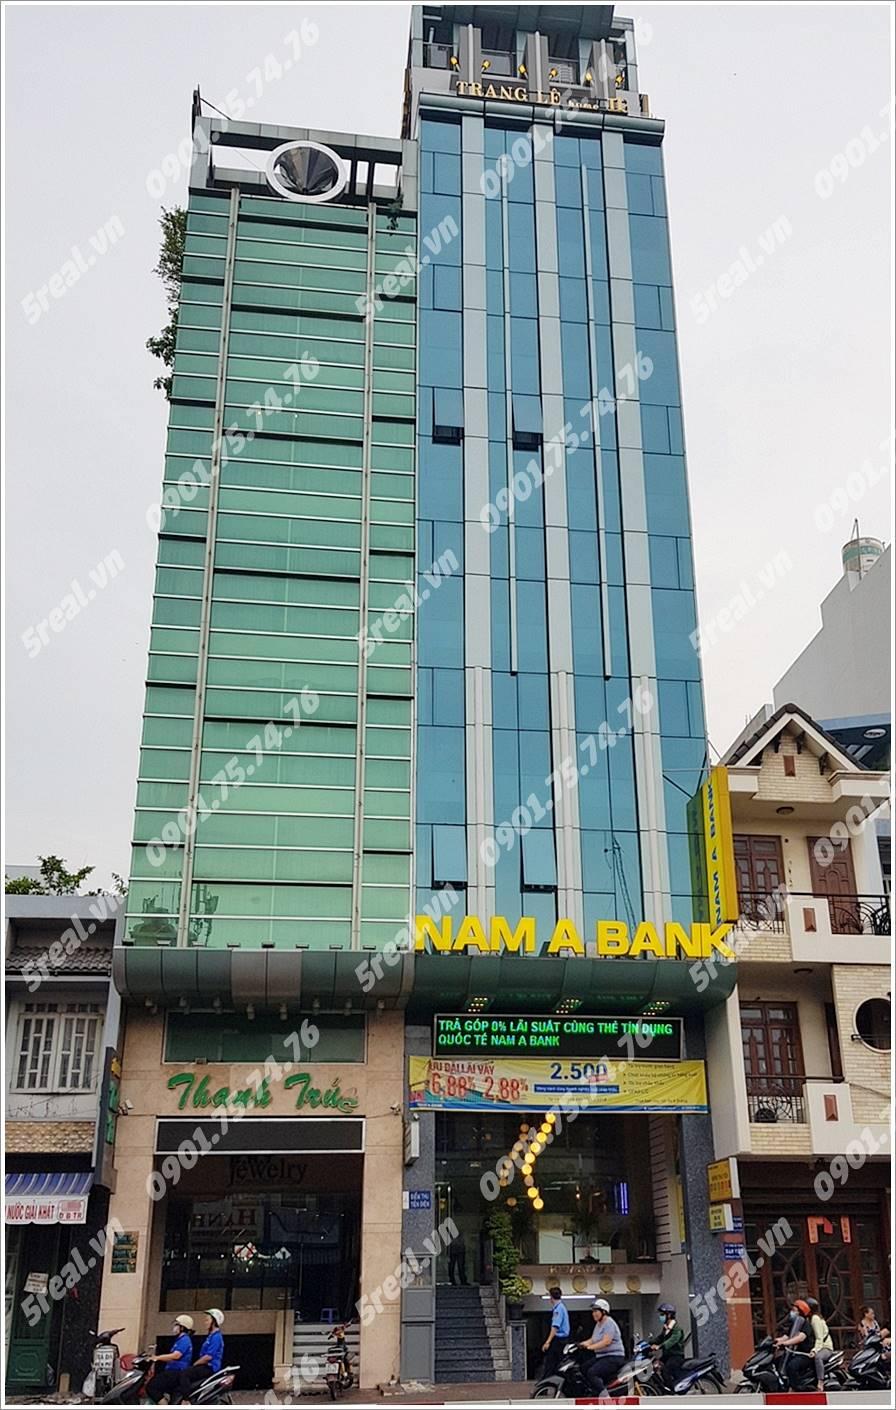 trang-le-building-duong-ba-trac-quan-8-van-phong-cho-thue-tphcm-5real.vn-01